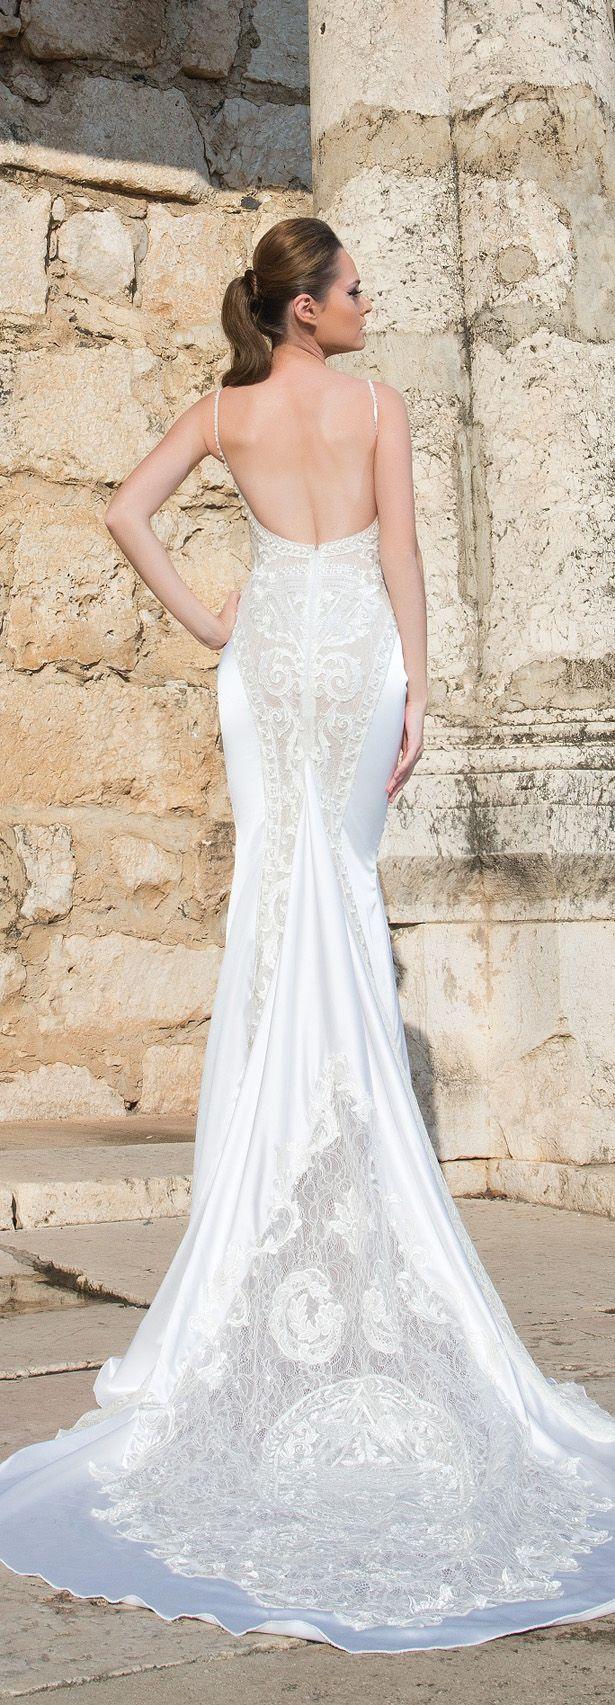 best images about dresses on pinterest gorgeous wedding dress